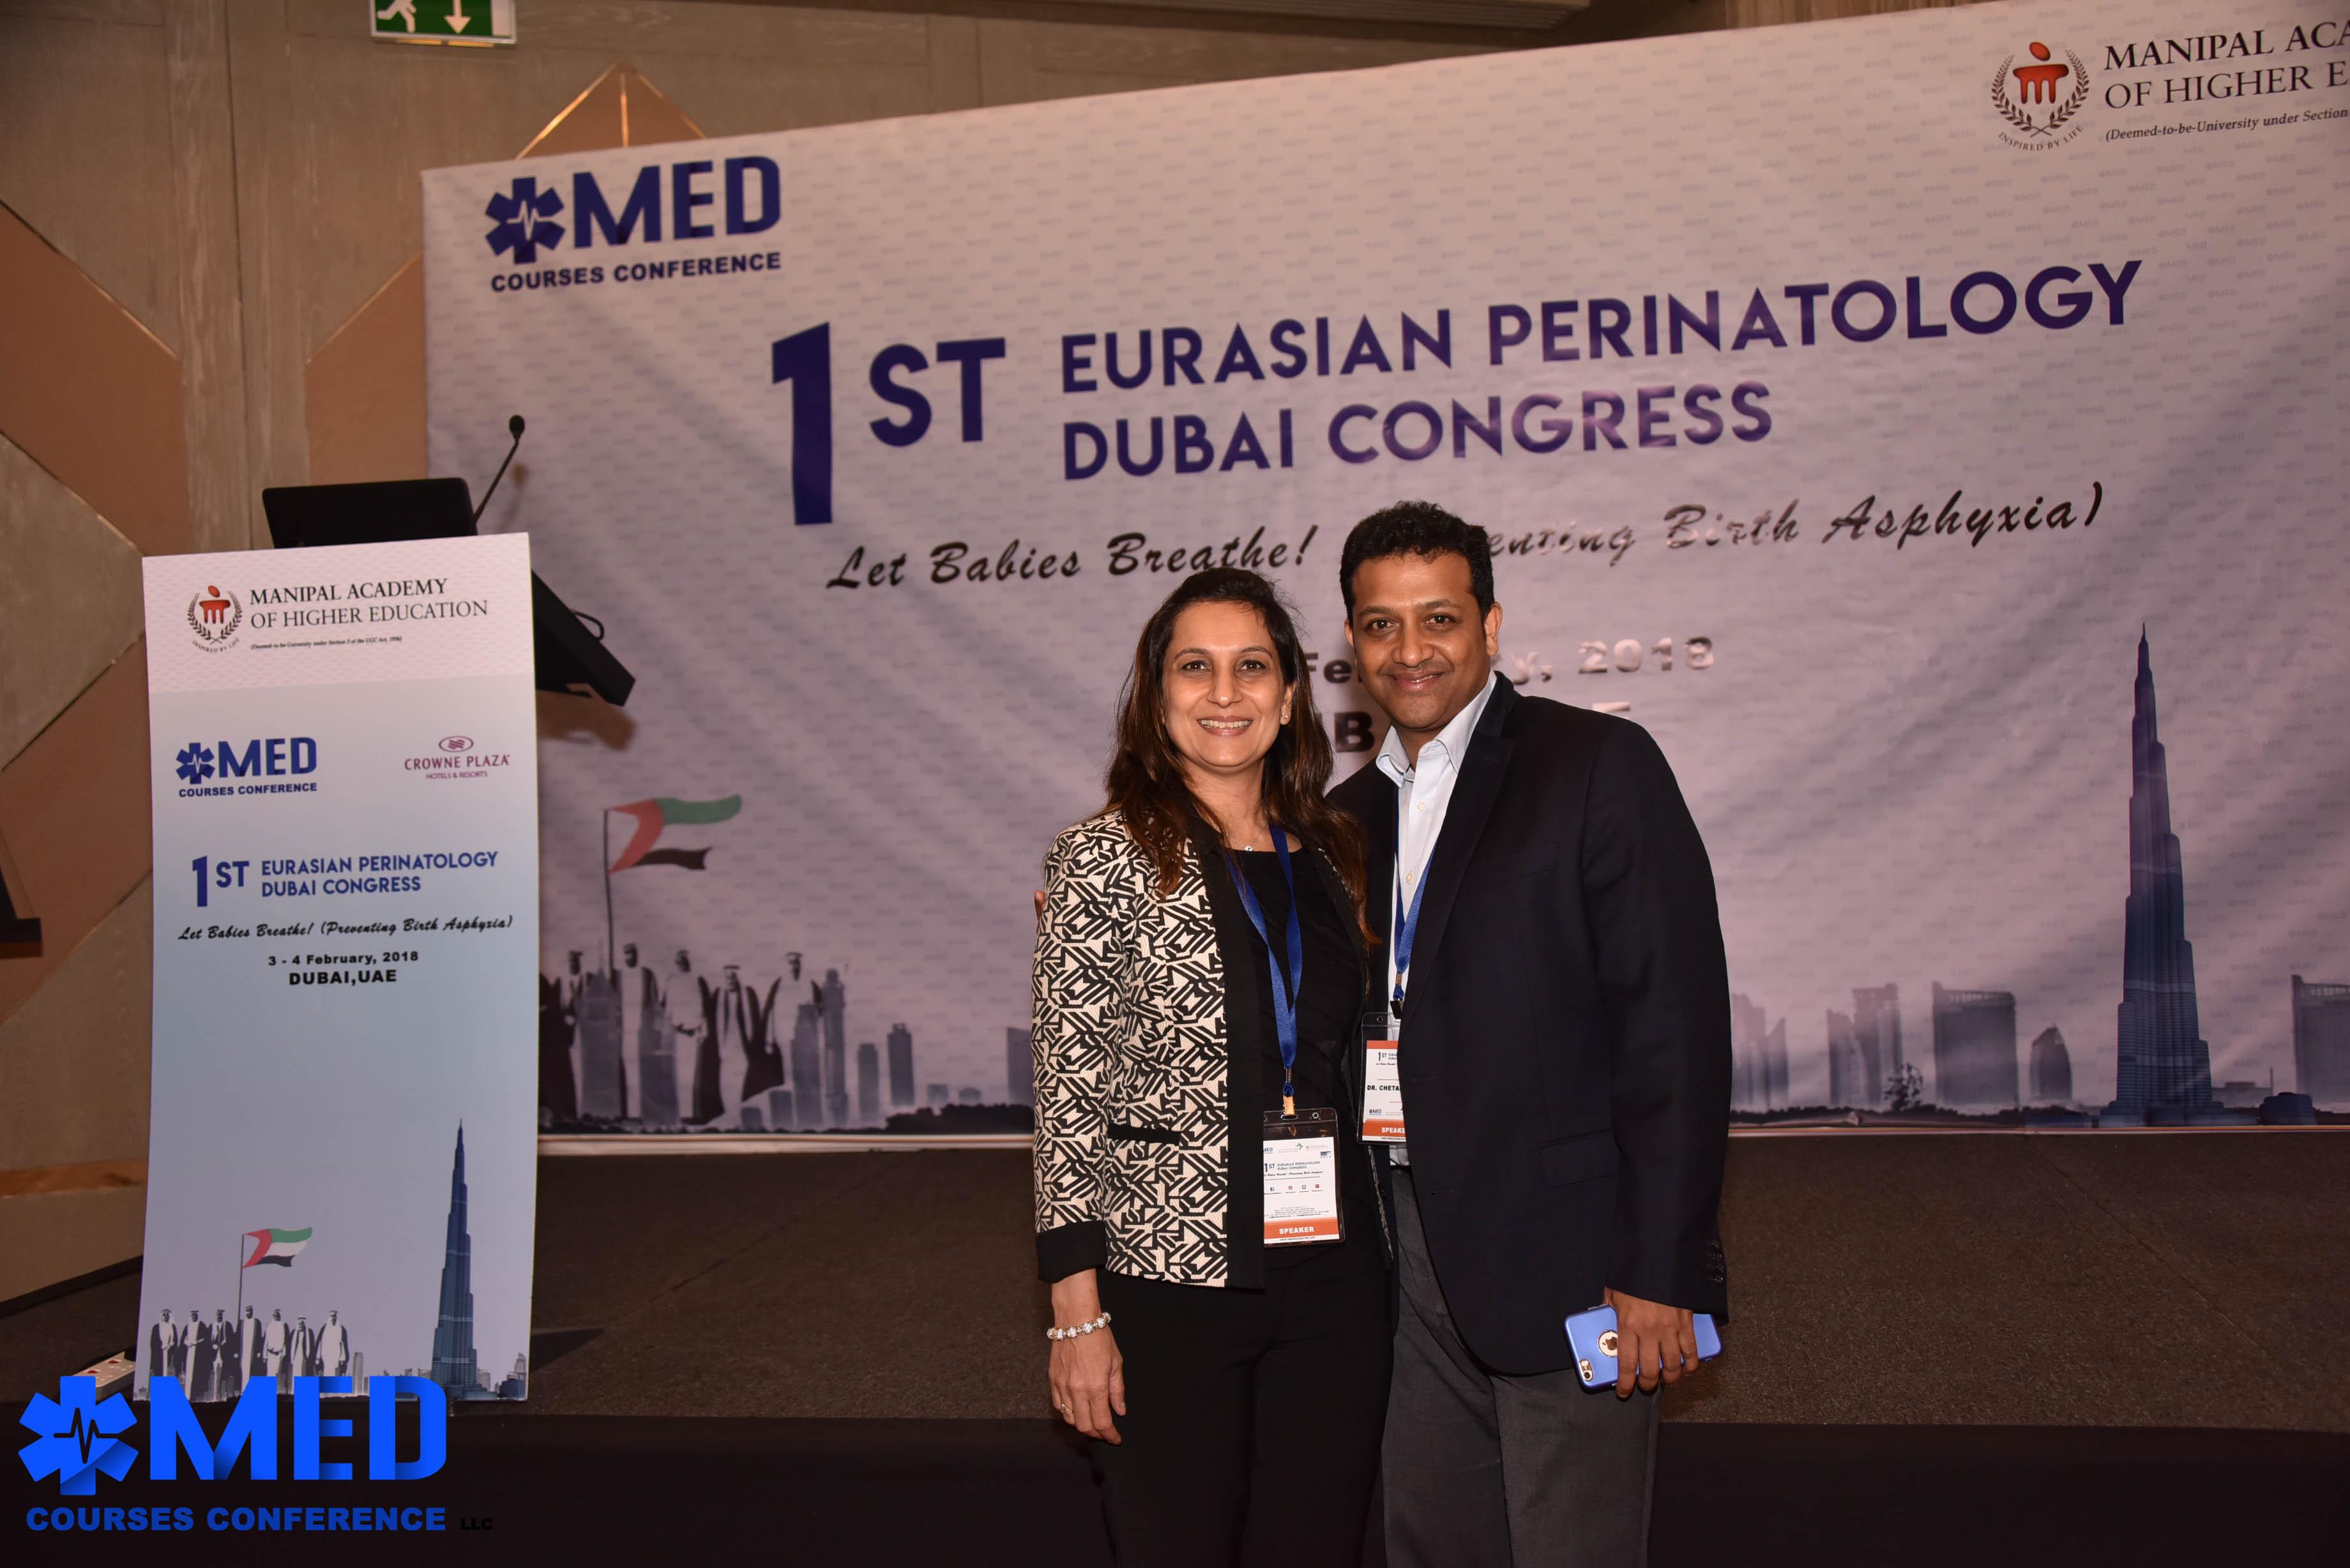 Dr. Roshu & Chetan Shetty